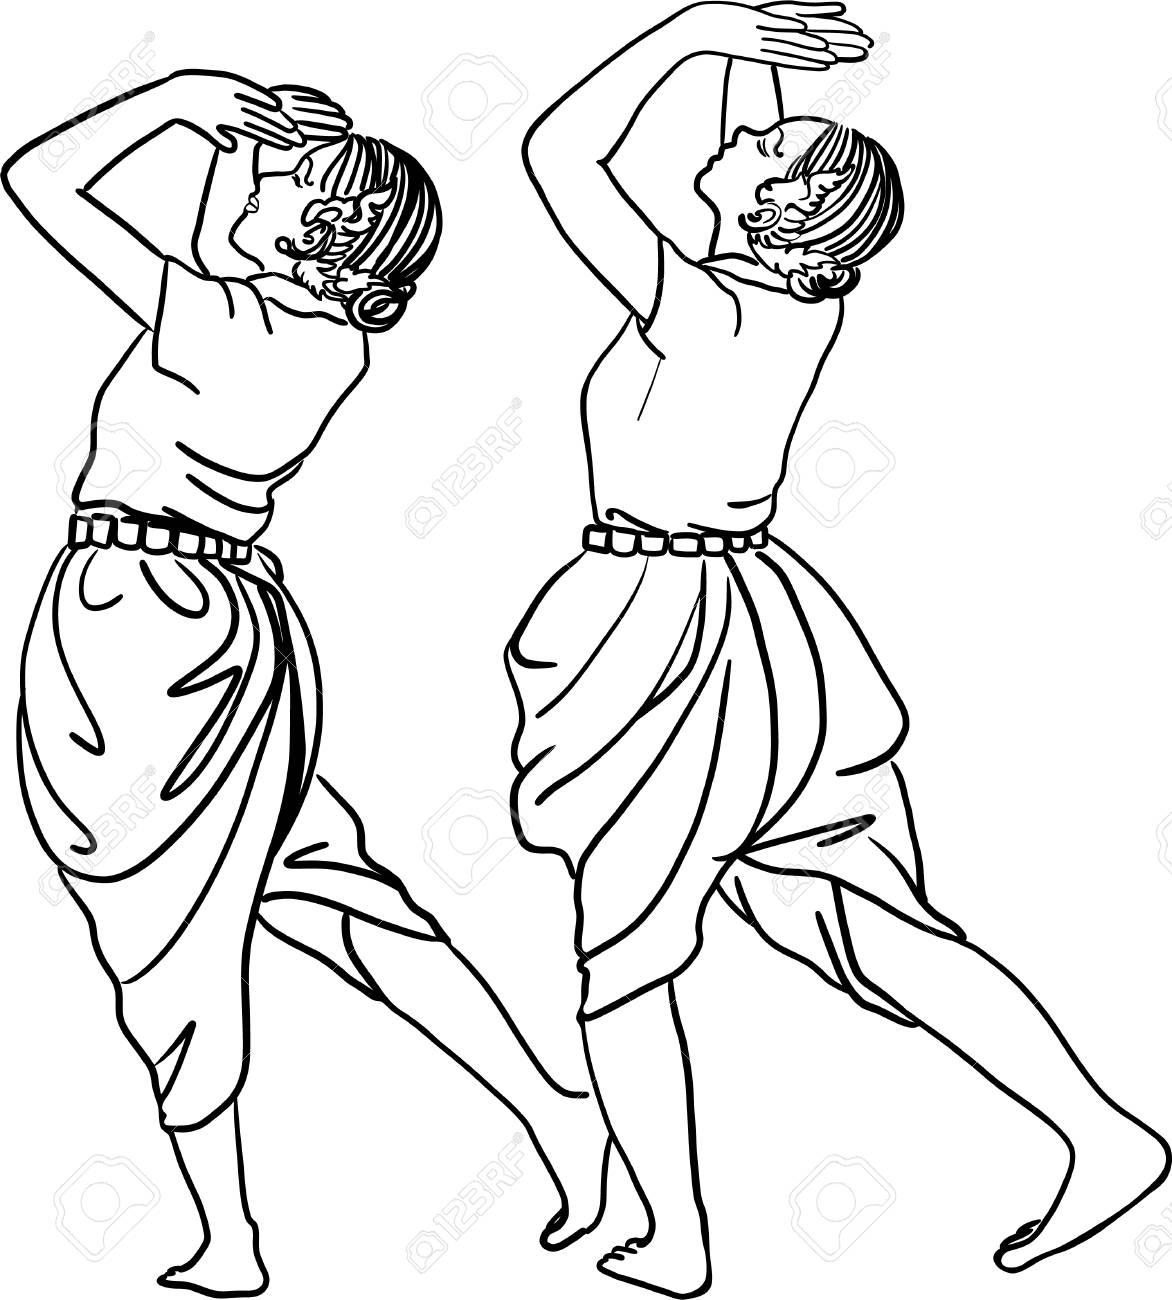 1172x1300 Art Drawing Of Thailand Dancing Art, Thai Classical Dance,(Ram